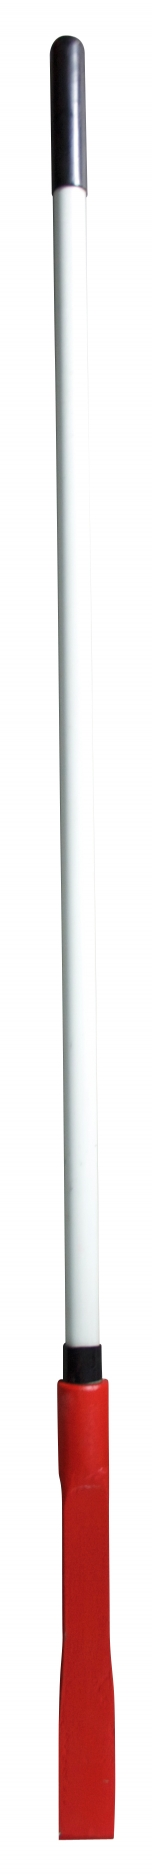 Breekstang rond Ø 32 mm fiber steel - vierkantig + beitel - 1400 mm